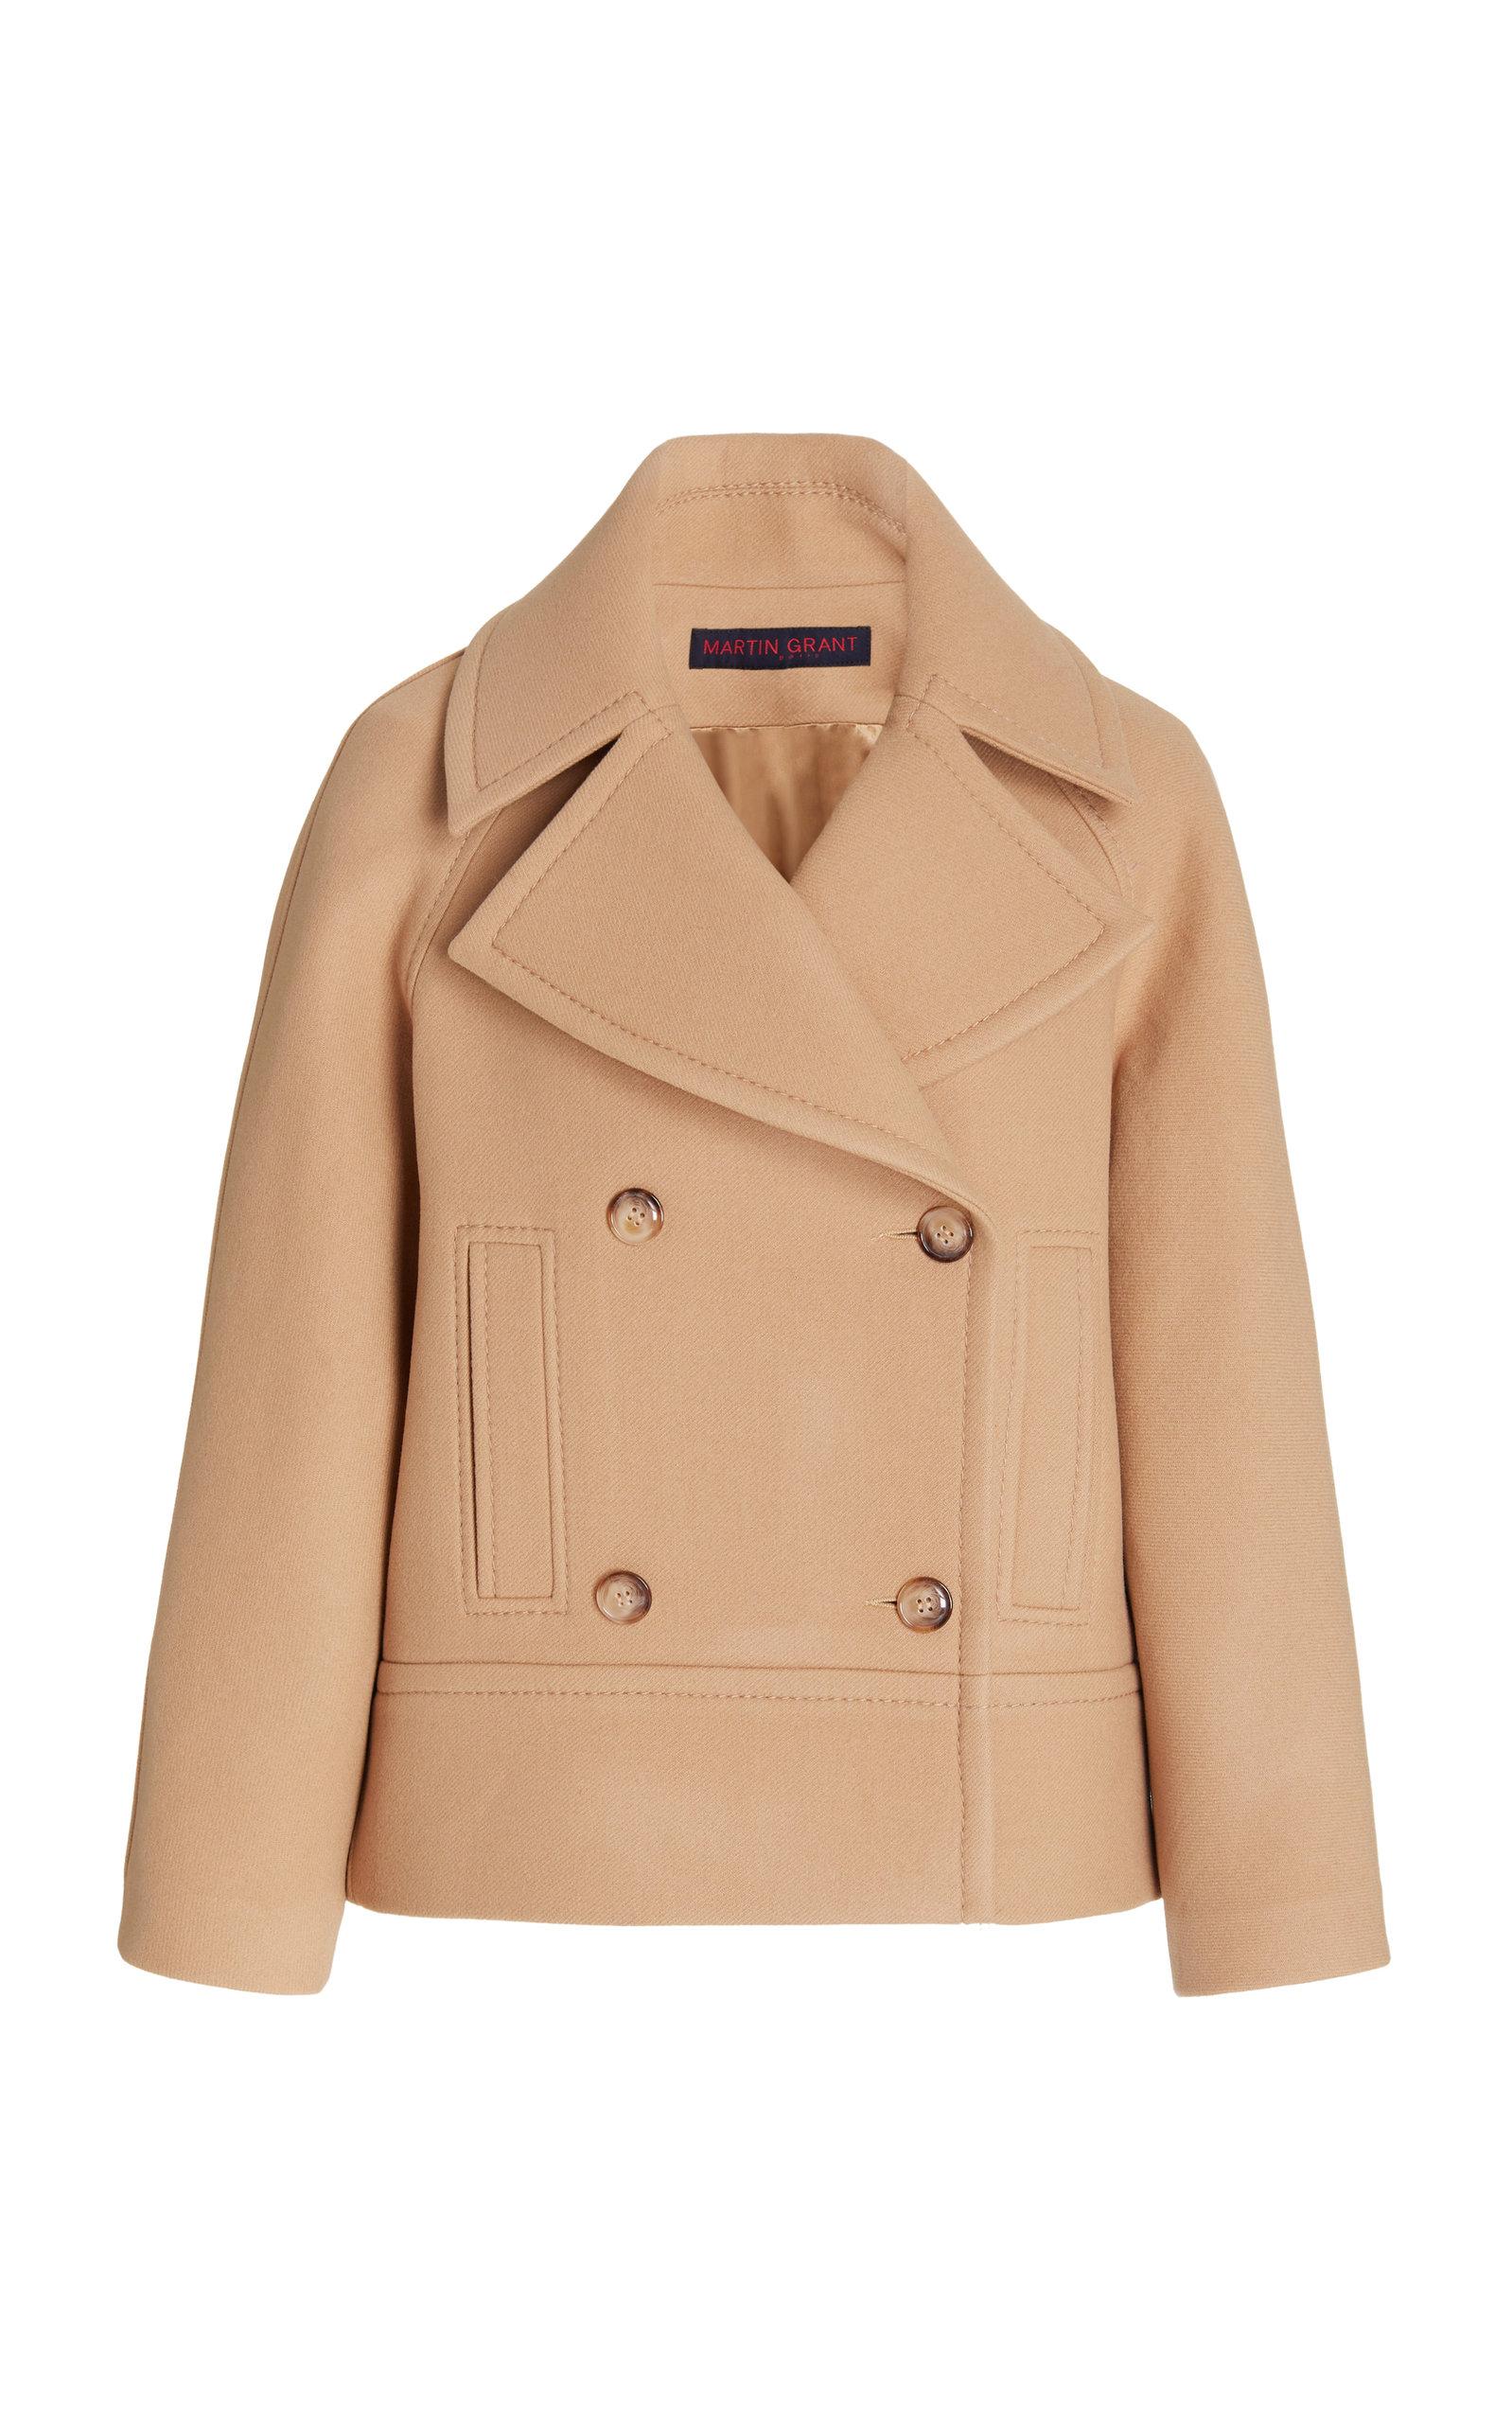 Women's Wool-Blend Double-Breasted Pea Coat